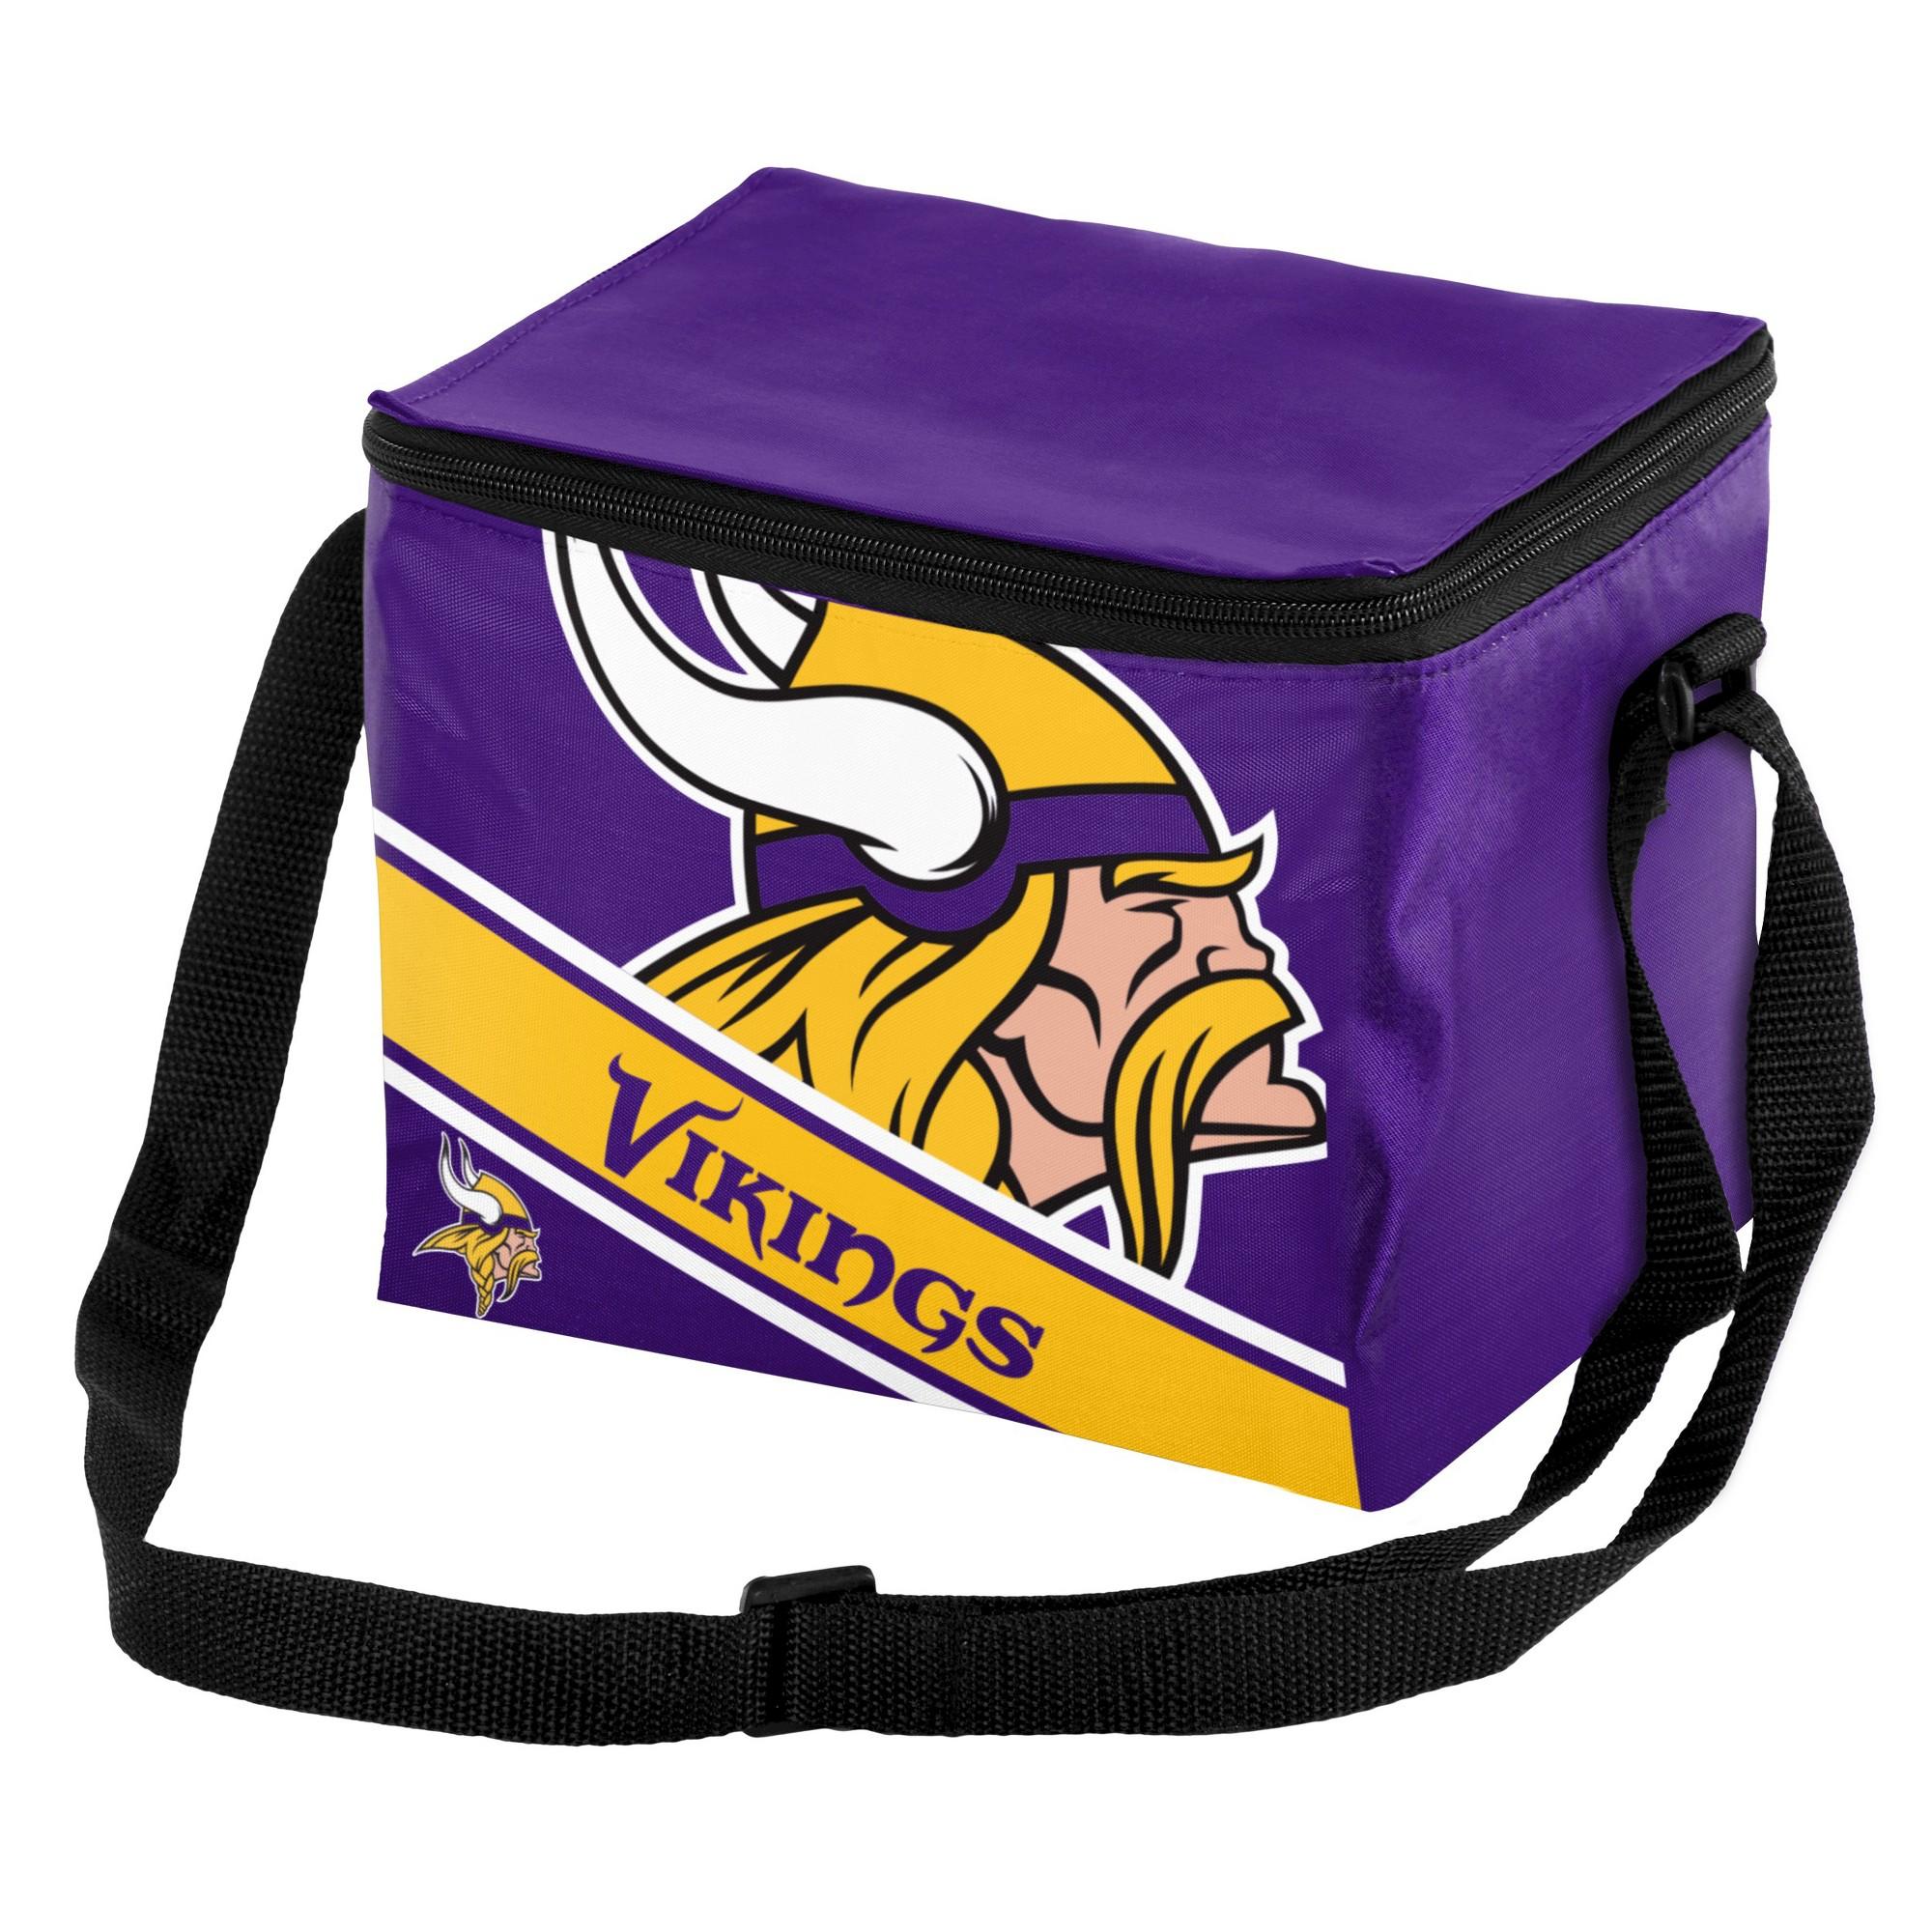 6d8e031b5 NFL Big Logo Stripe 6 Pack Cooler-Minnesota Vikings